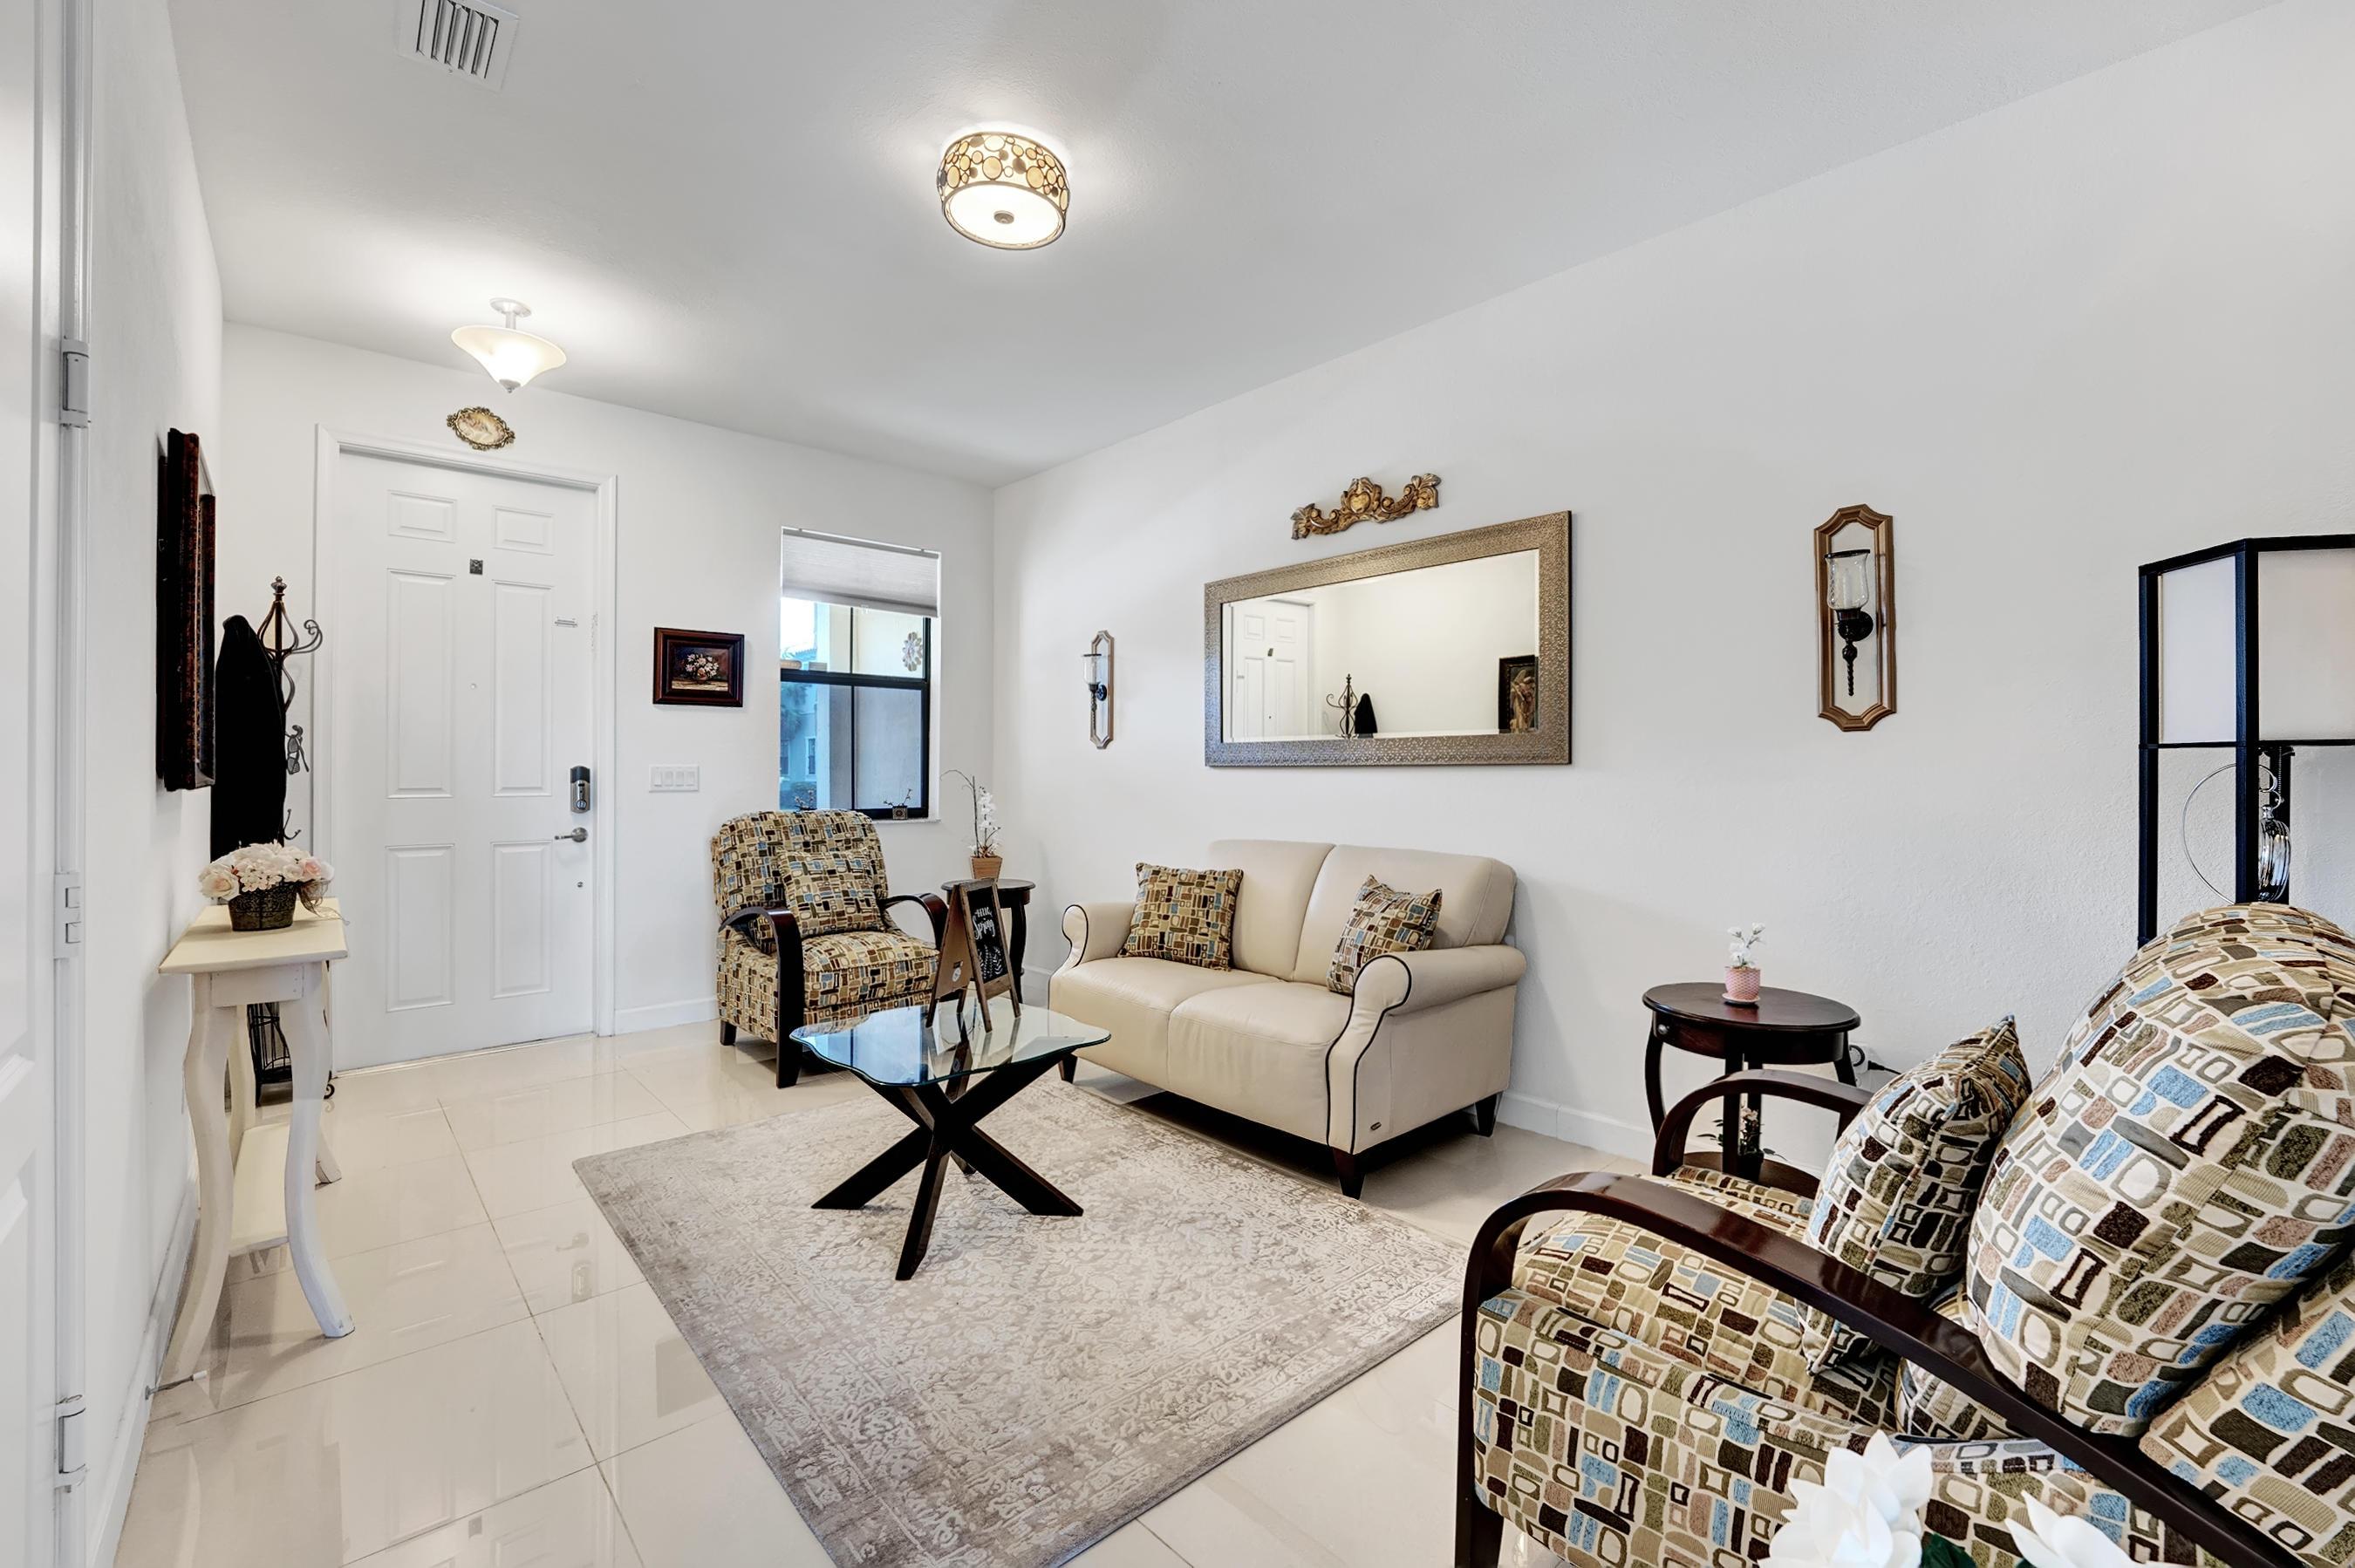 12941 Anthorne Lane - 33436 - FL - Boynton Beach